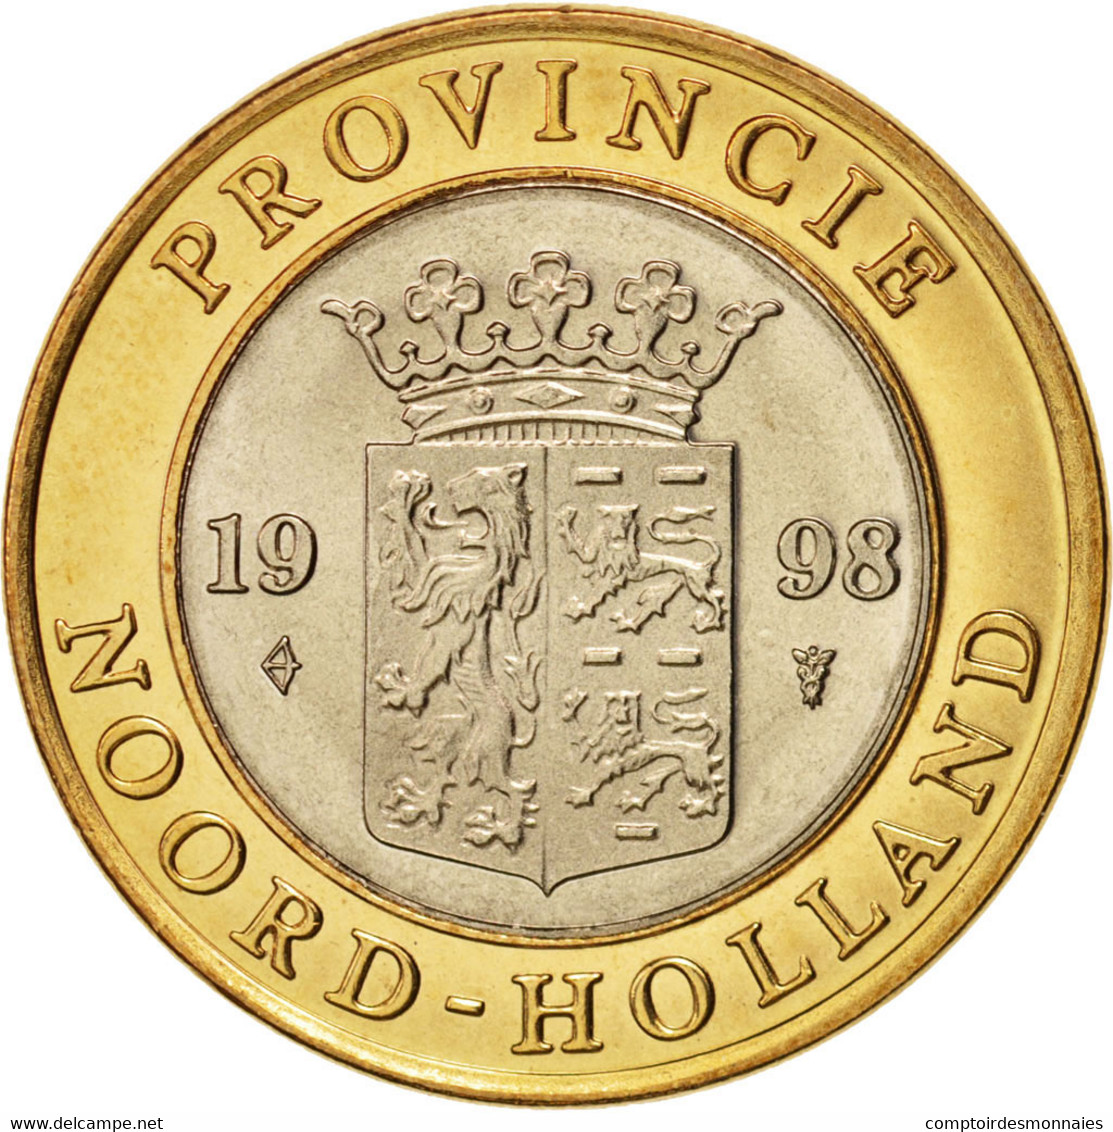 Pays-Bas, Token, Noord-Holland, Mint, 1998, SPL, Bi-Metallic - Pays-Bas